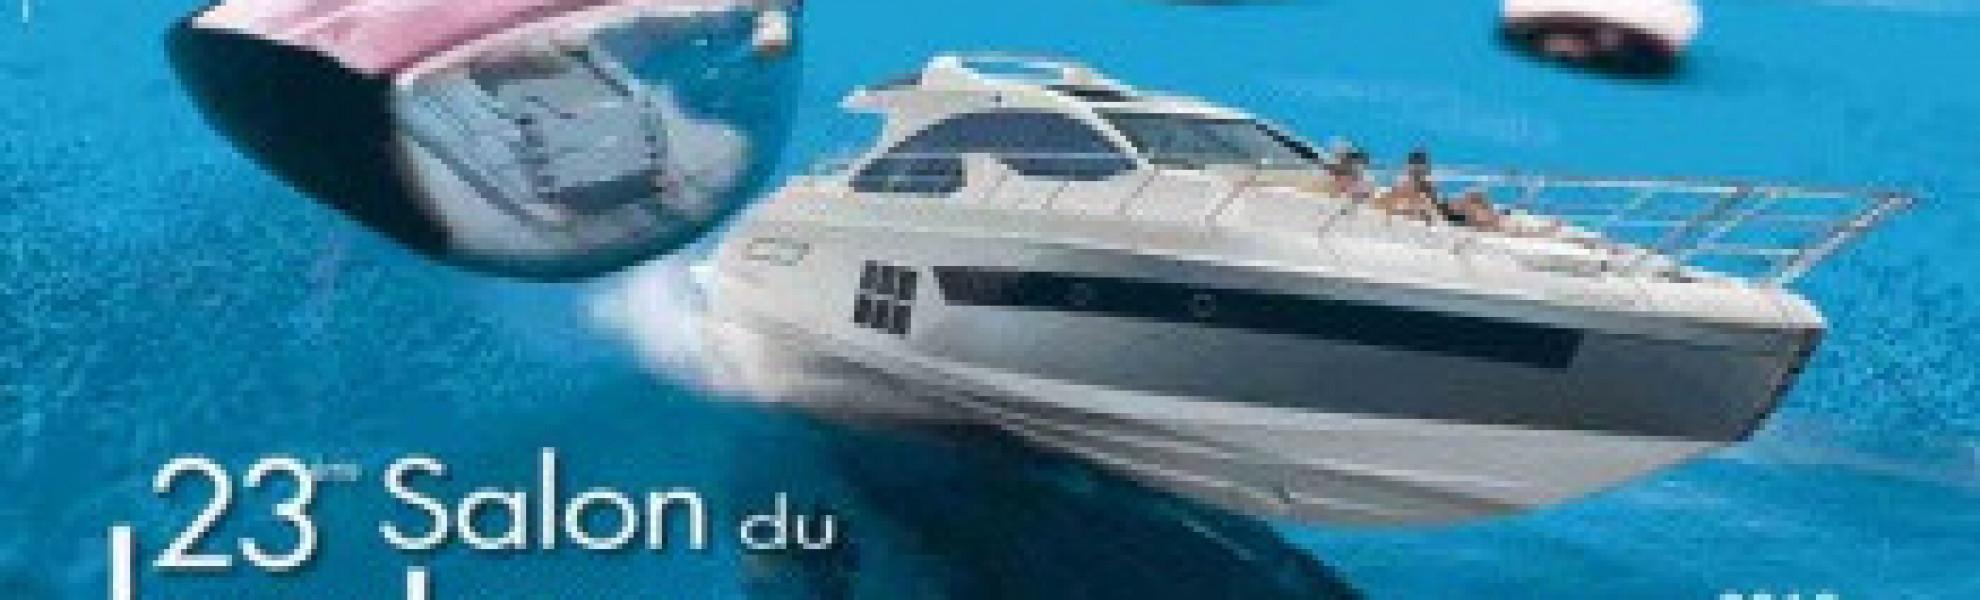 Salon du bateau d'occasion de Mandelieu 25-29 avril